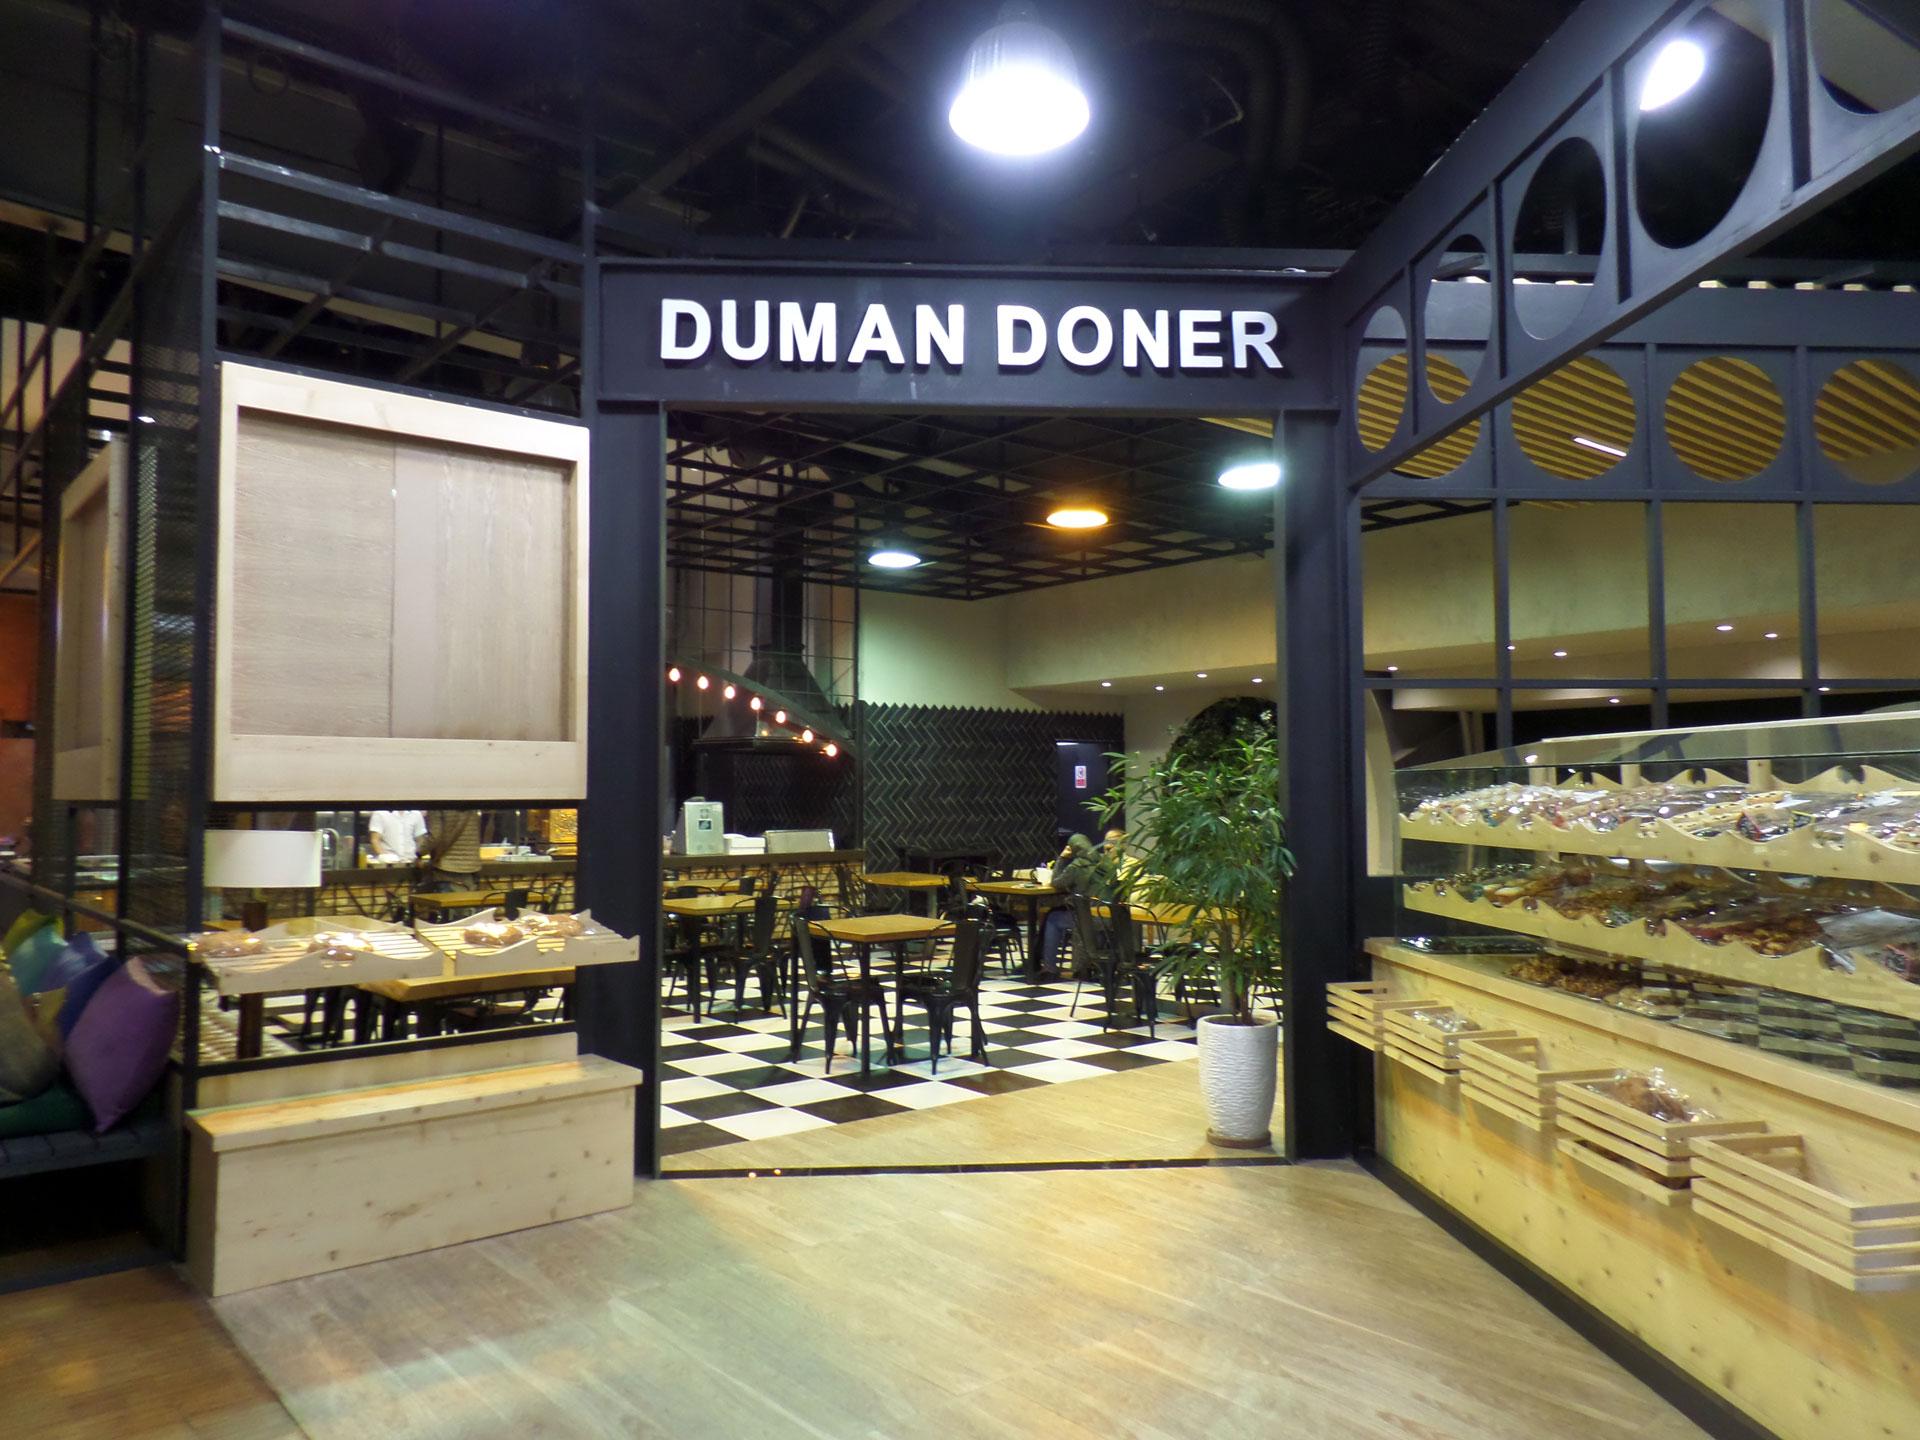 رستوران دومان دونر ، رستوران ترکیه ای مجتمع گردشگری مهر و ماه قم